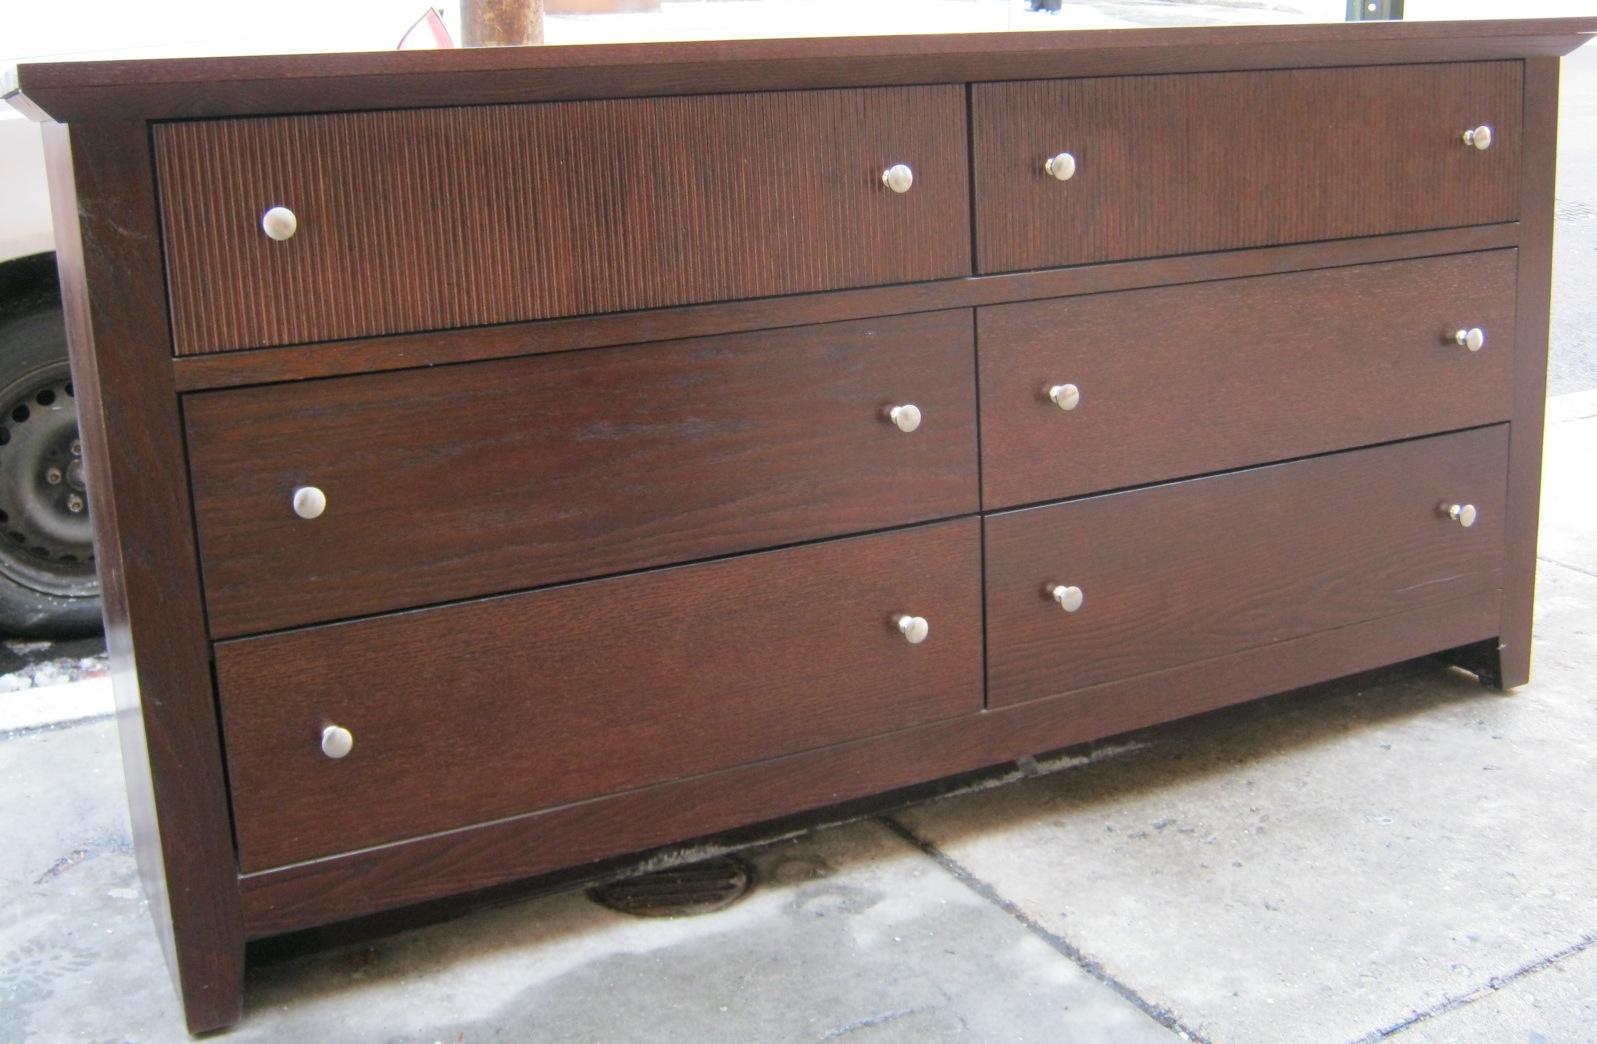 Uhuru furniture collectibles espresso bedroom set sold for Espresso bedroom furniture